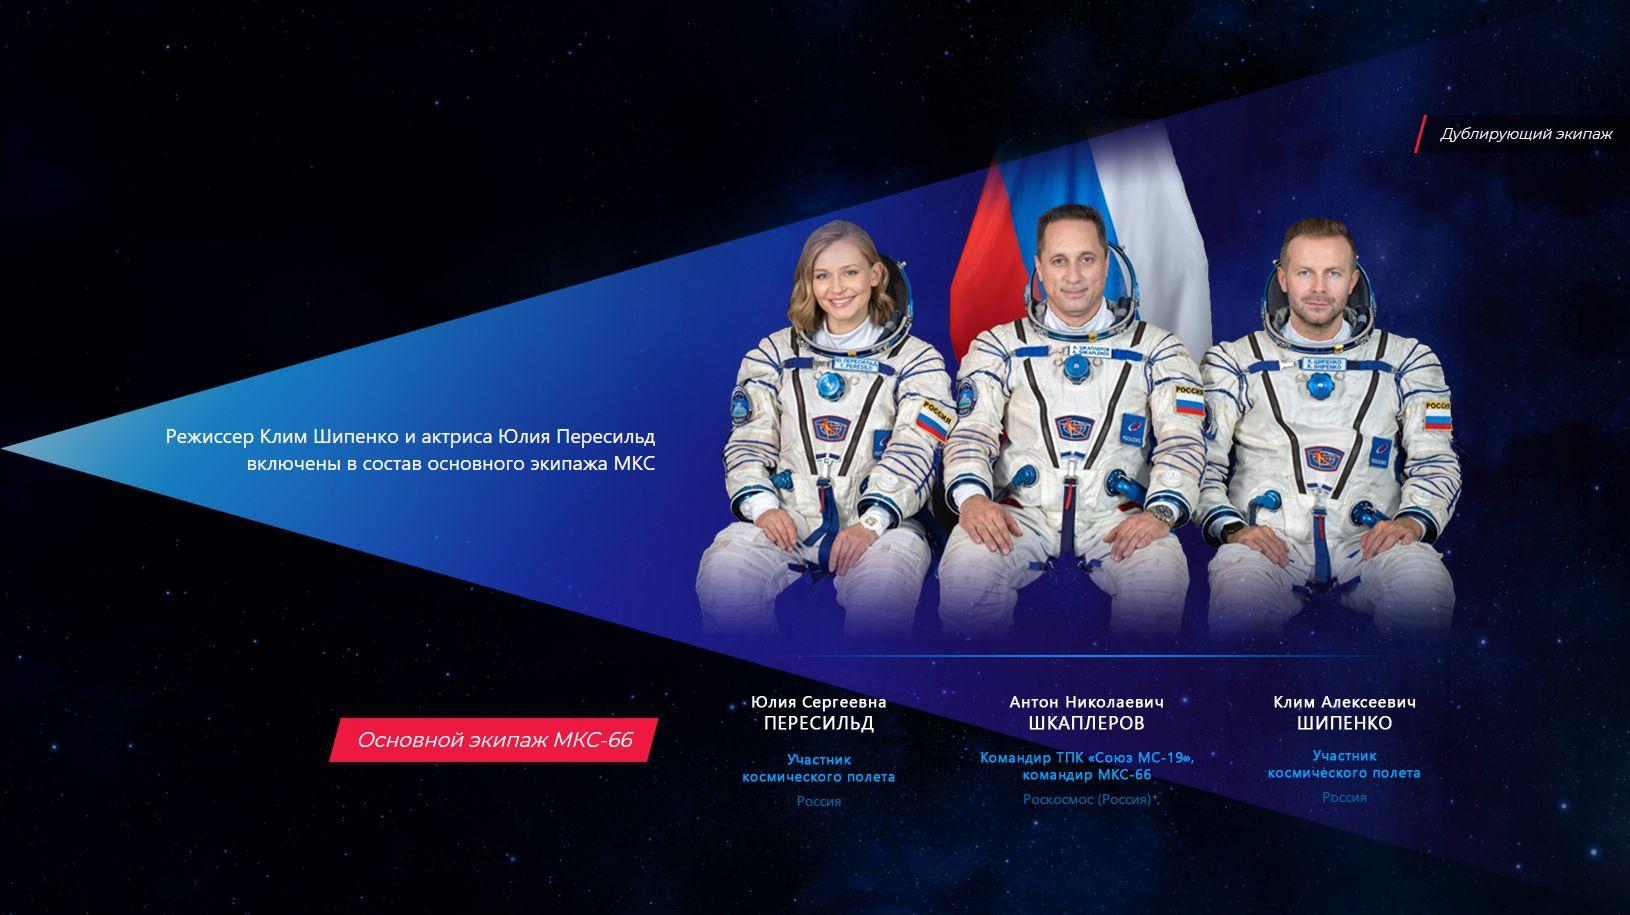 film-russe-espace-peresild-shkaplerov-shipenko